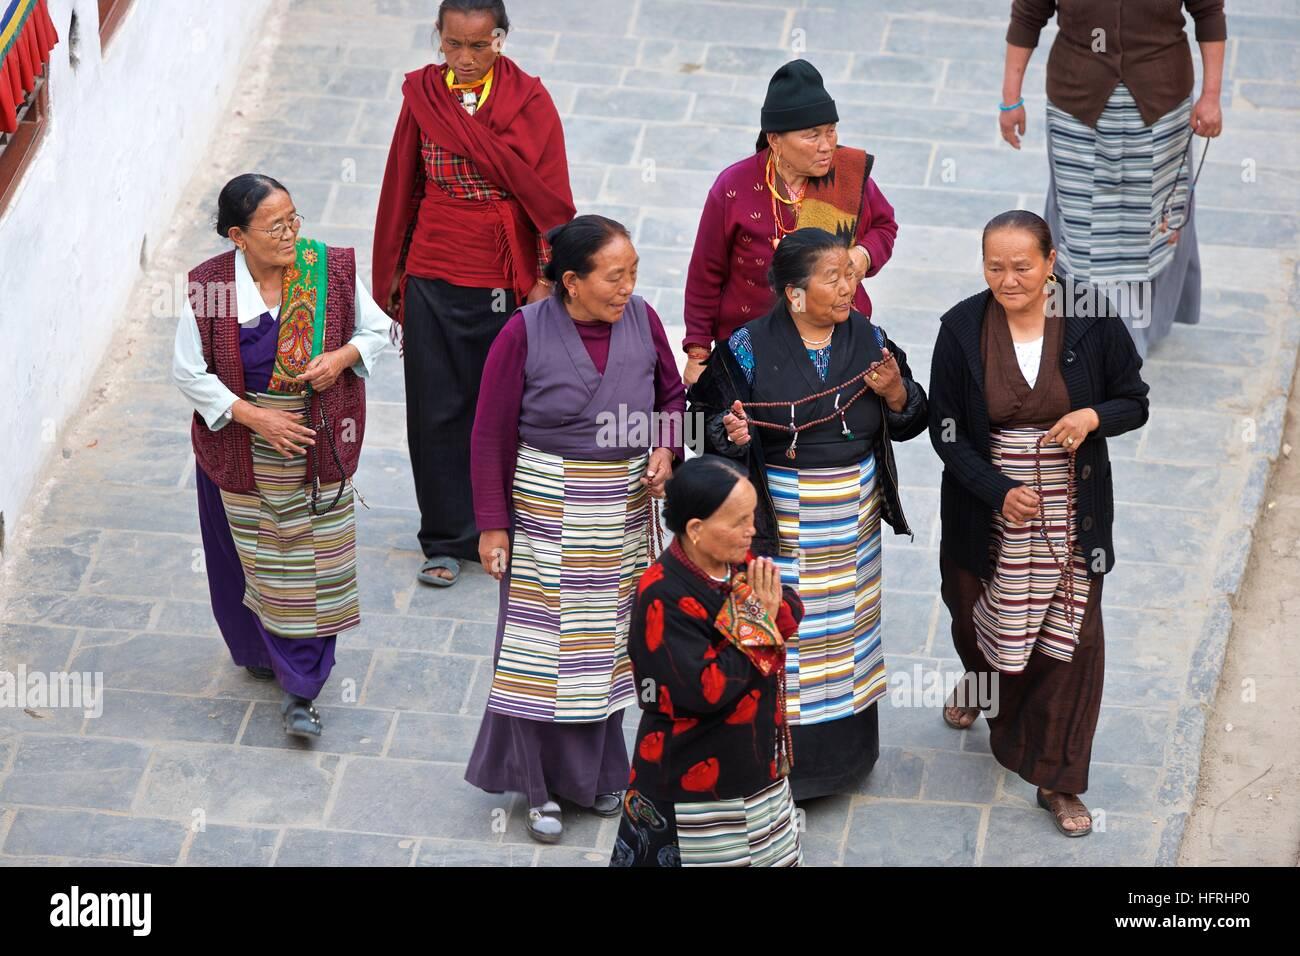 b49f98234 Nepal Kathmandu Asia local traditional dress women attire costume custom  religion candid